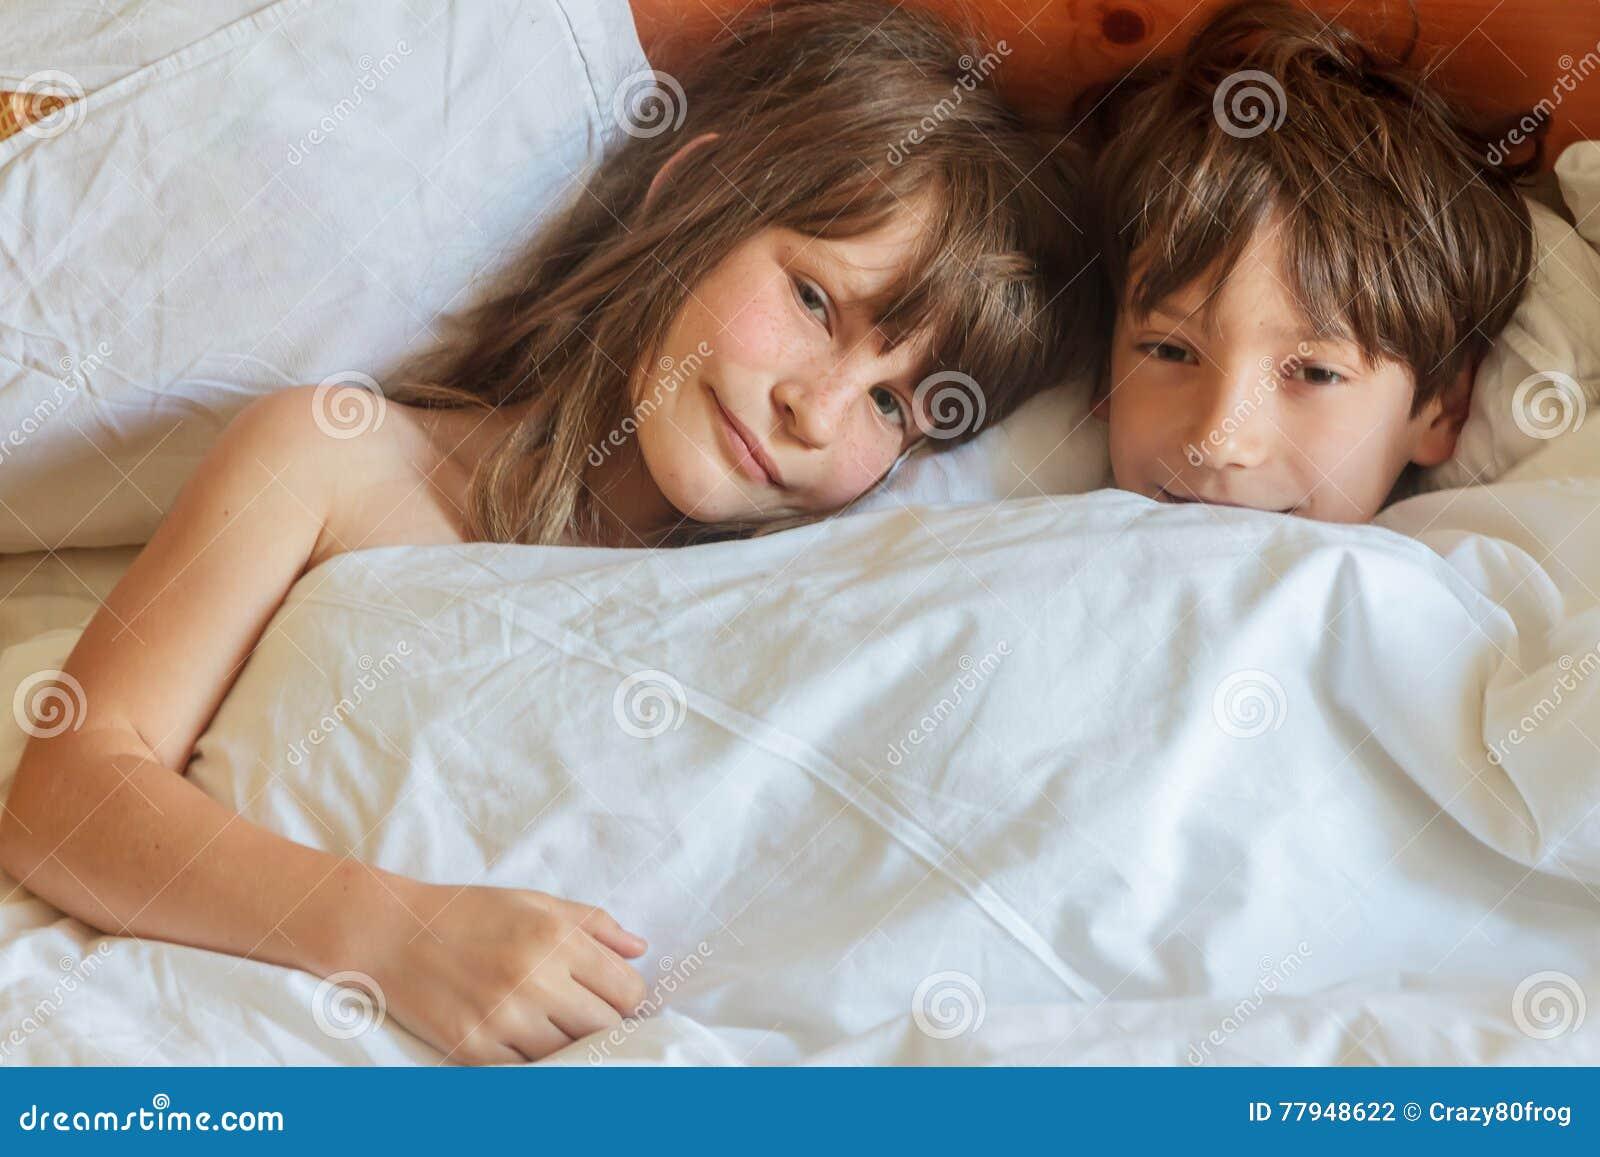 сестрой в постели фото с